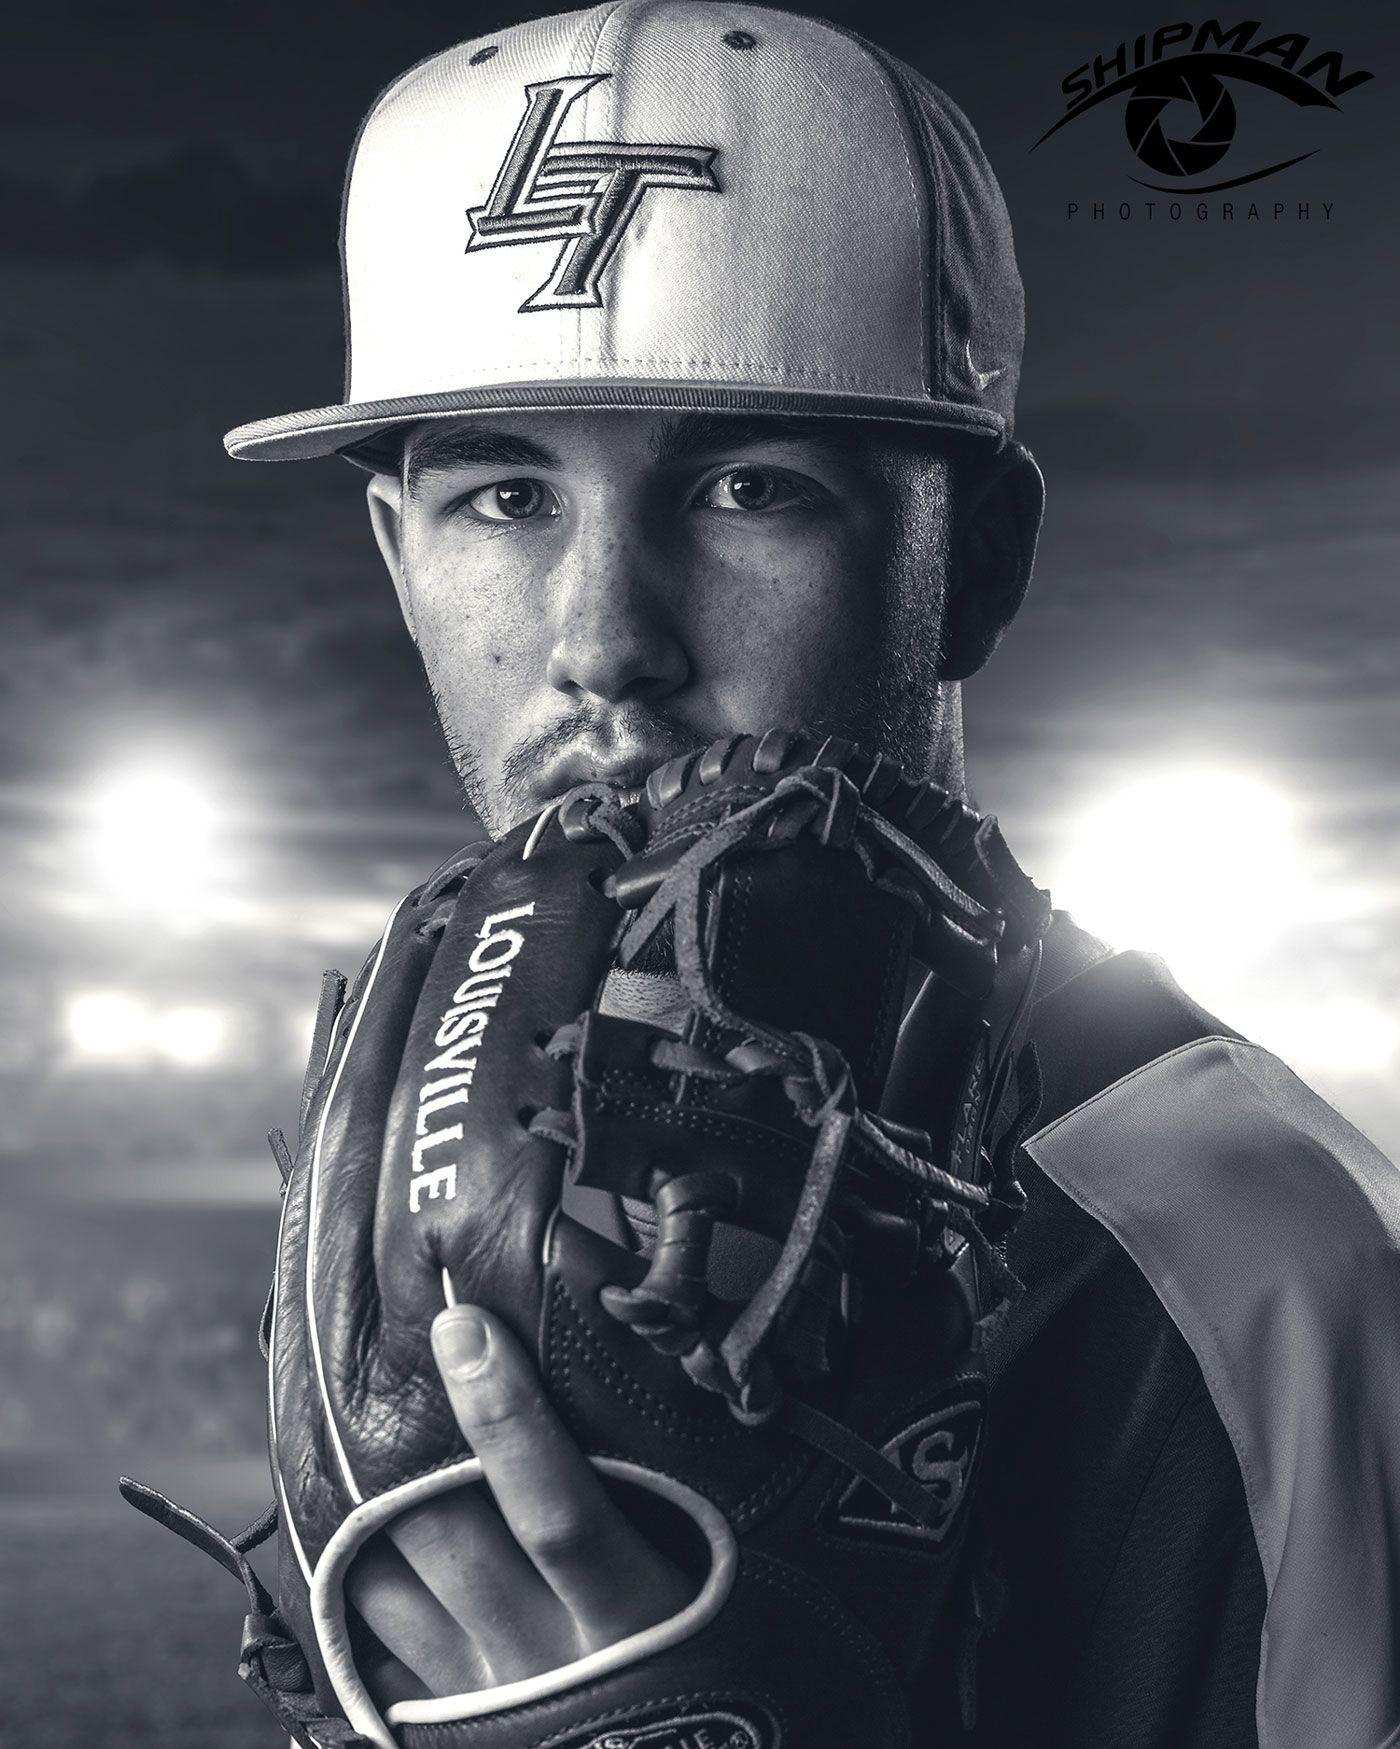 composite senior portrait of a baseball pitcher